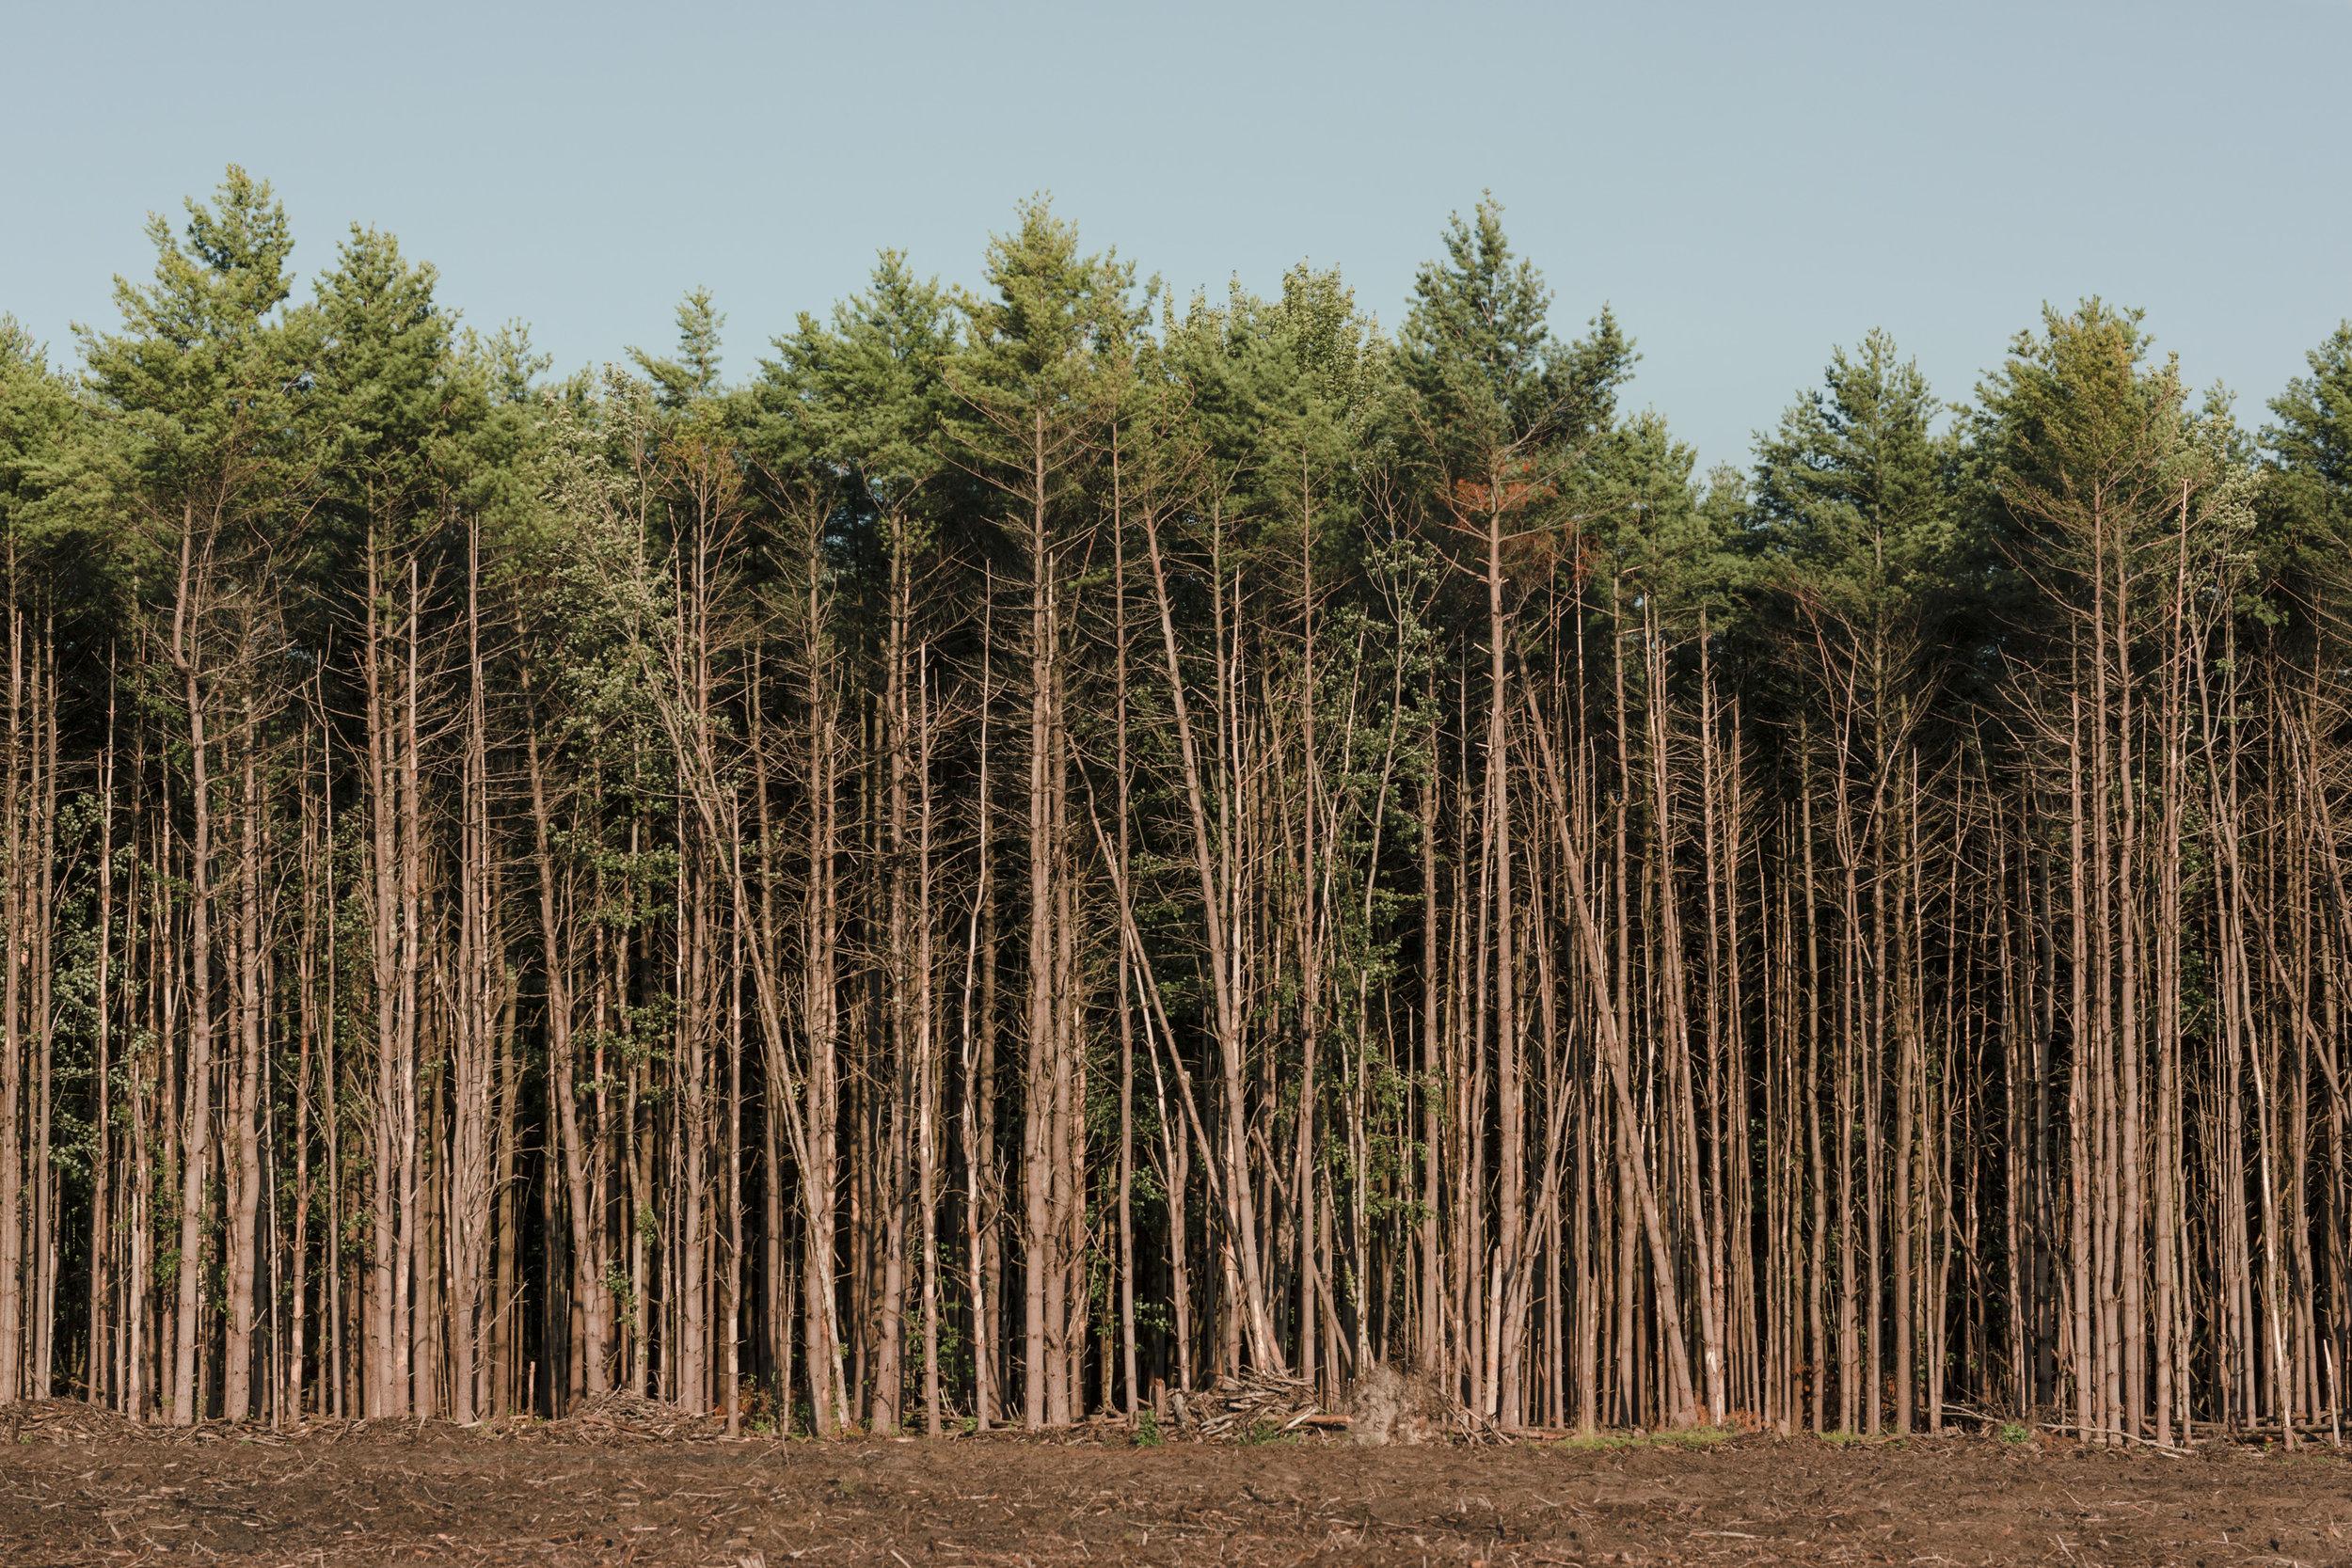 tree-cutting-cp-2019-web-23.jpg